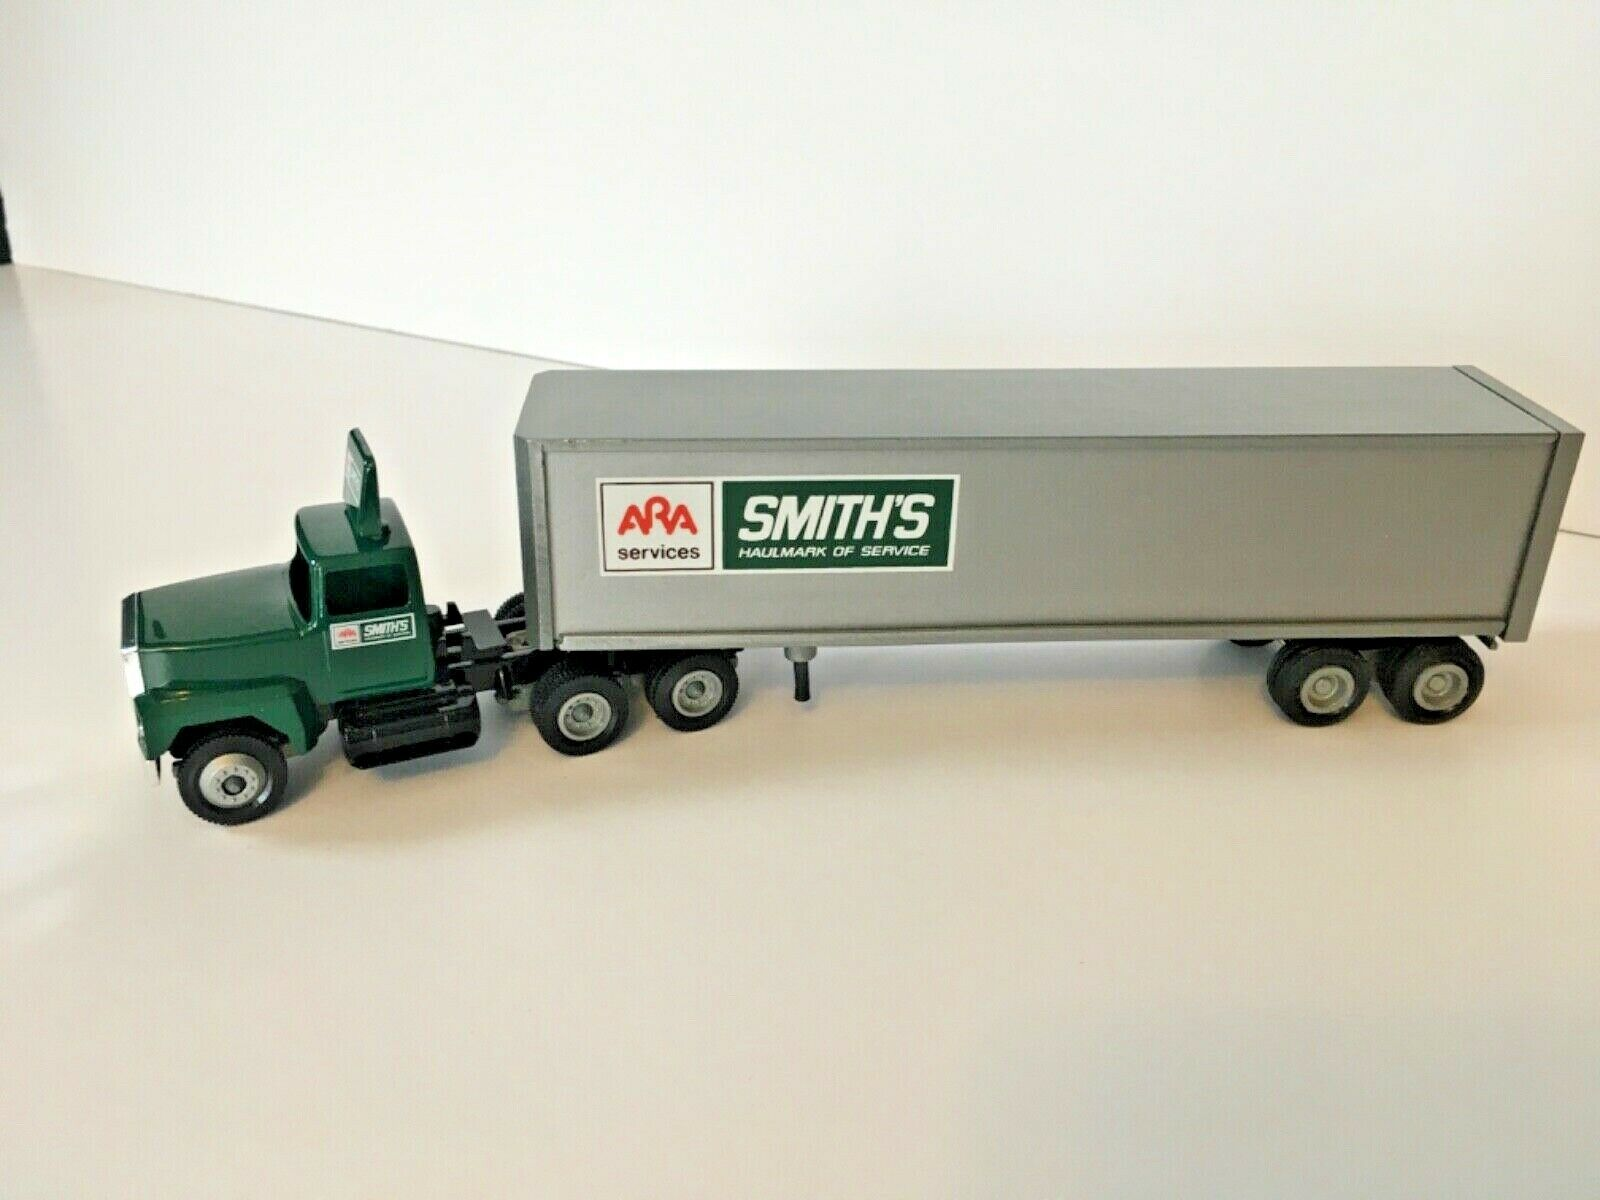 Smiths ARA Transfer '86 Winross Tractor Trailer Model